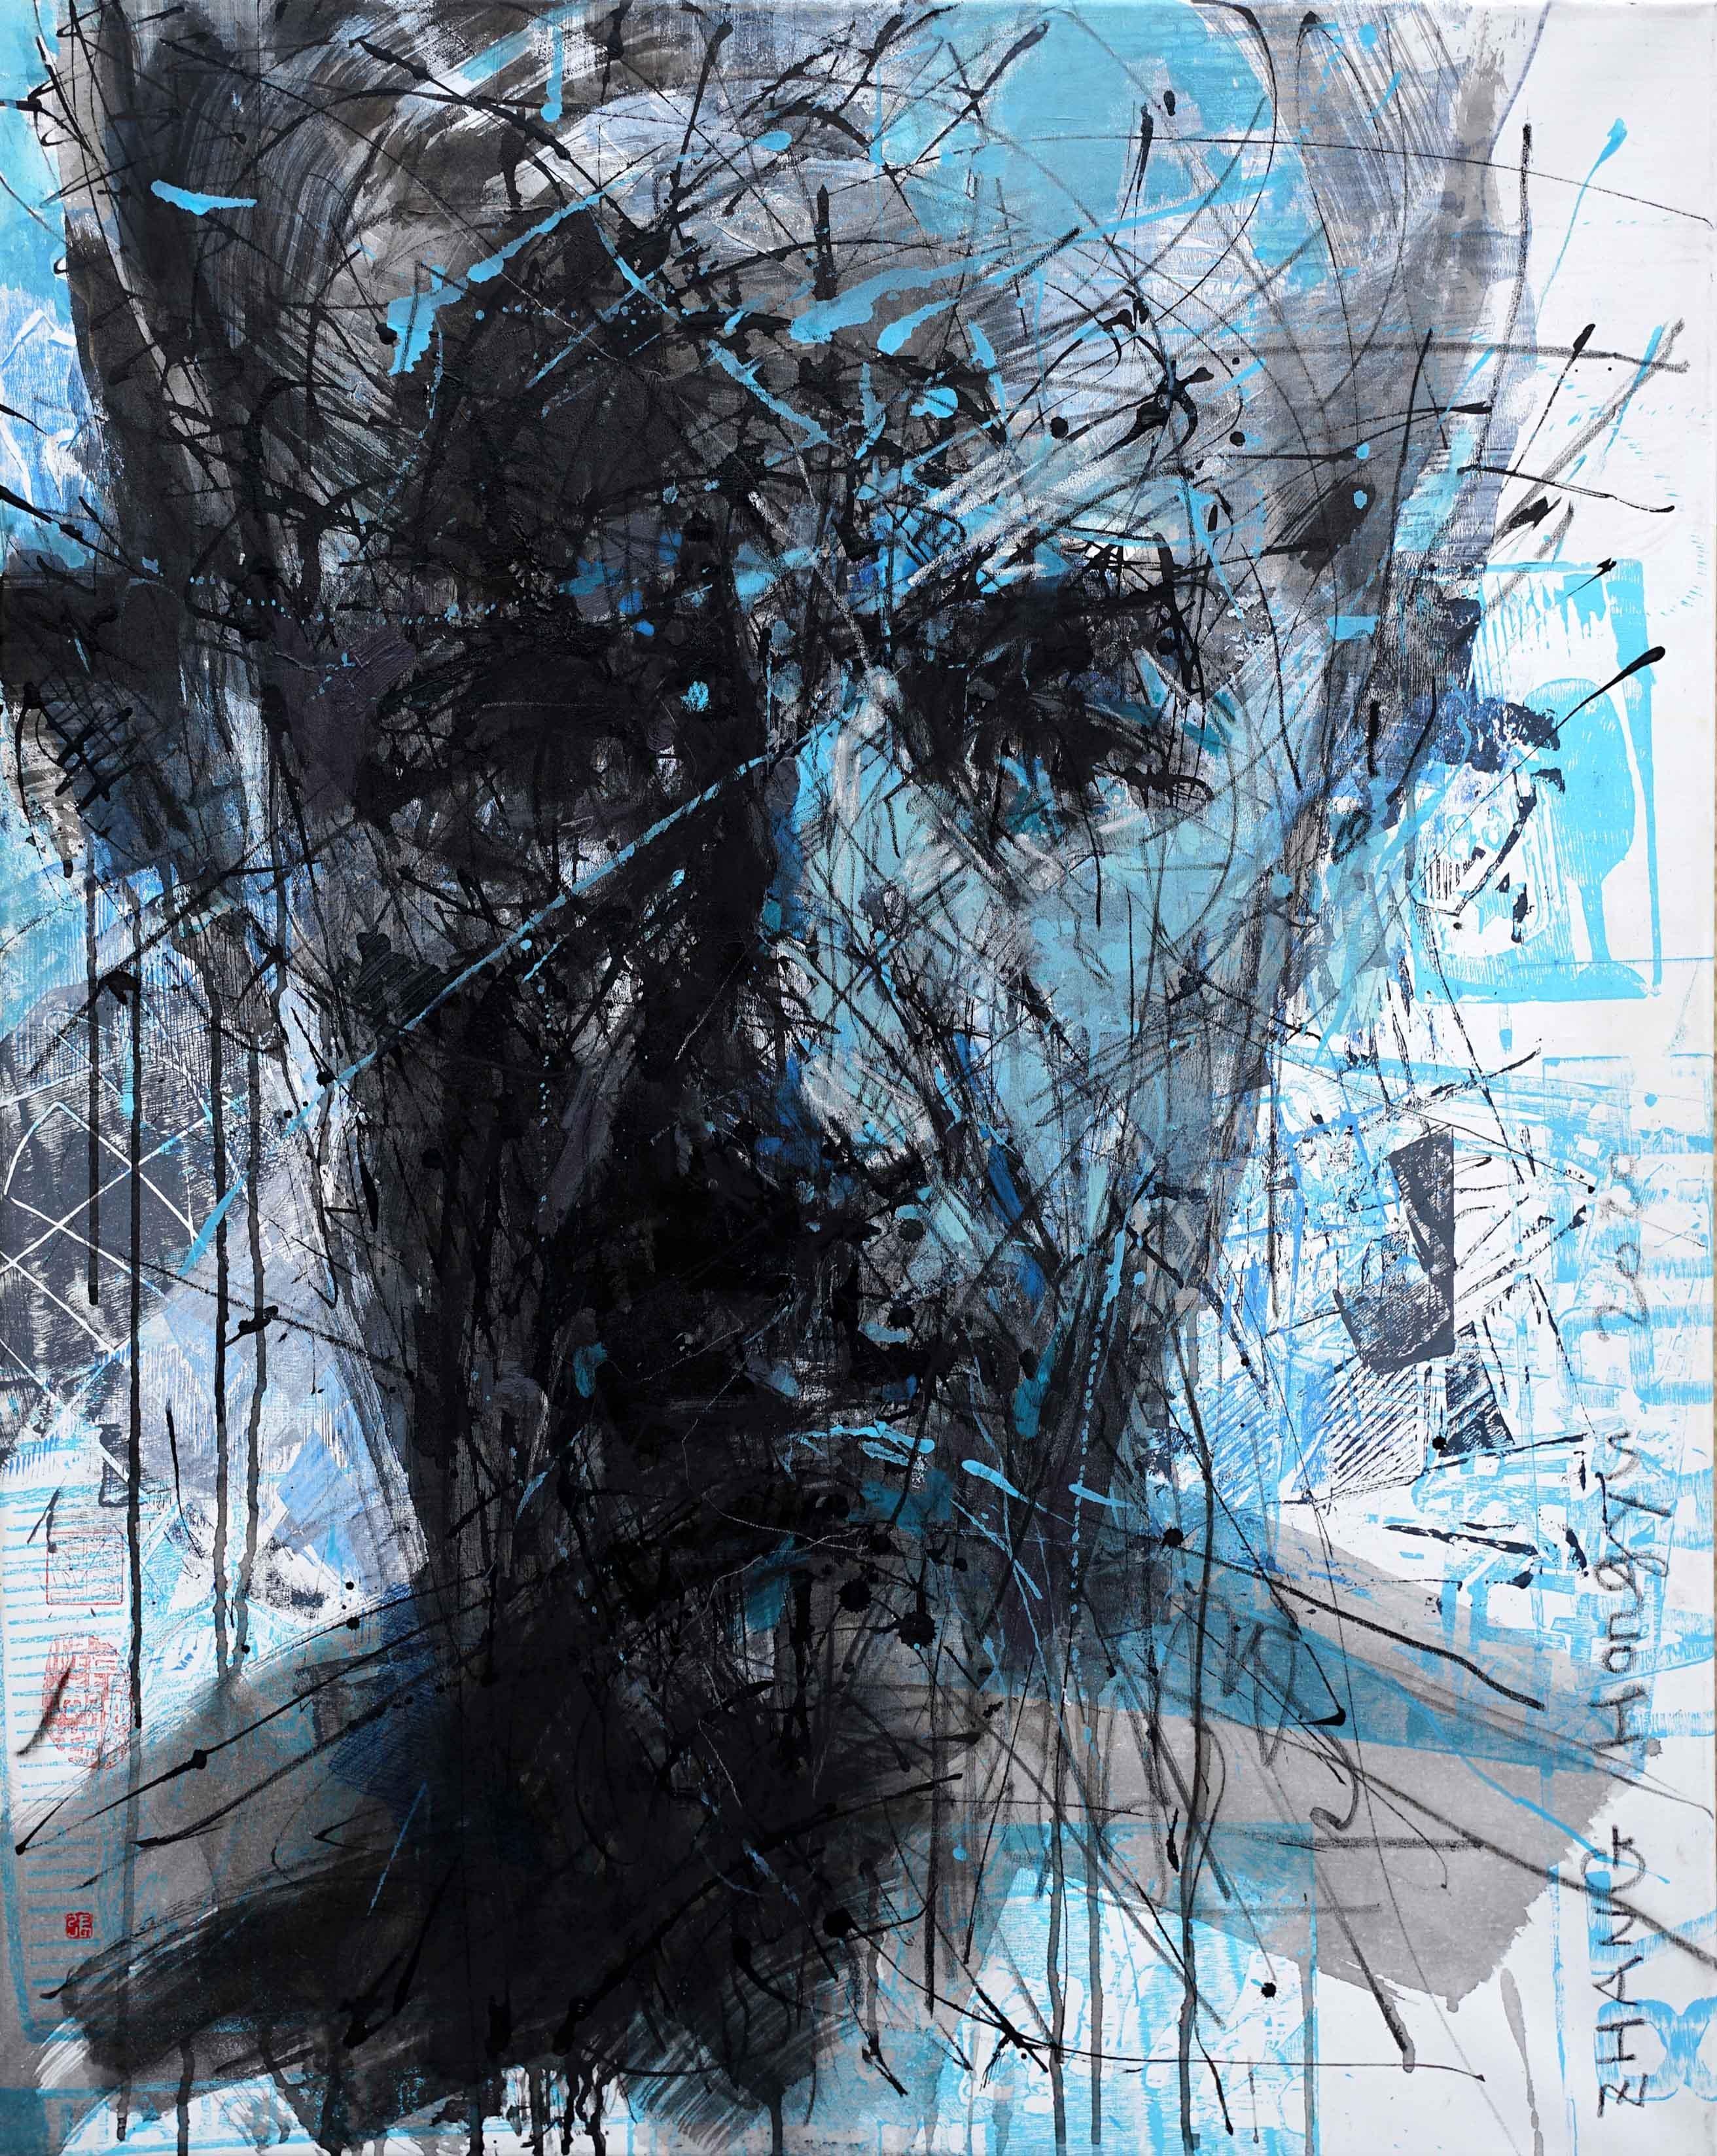 No. 196 (contemporary portrait painting)